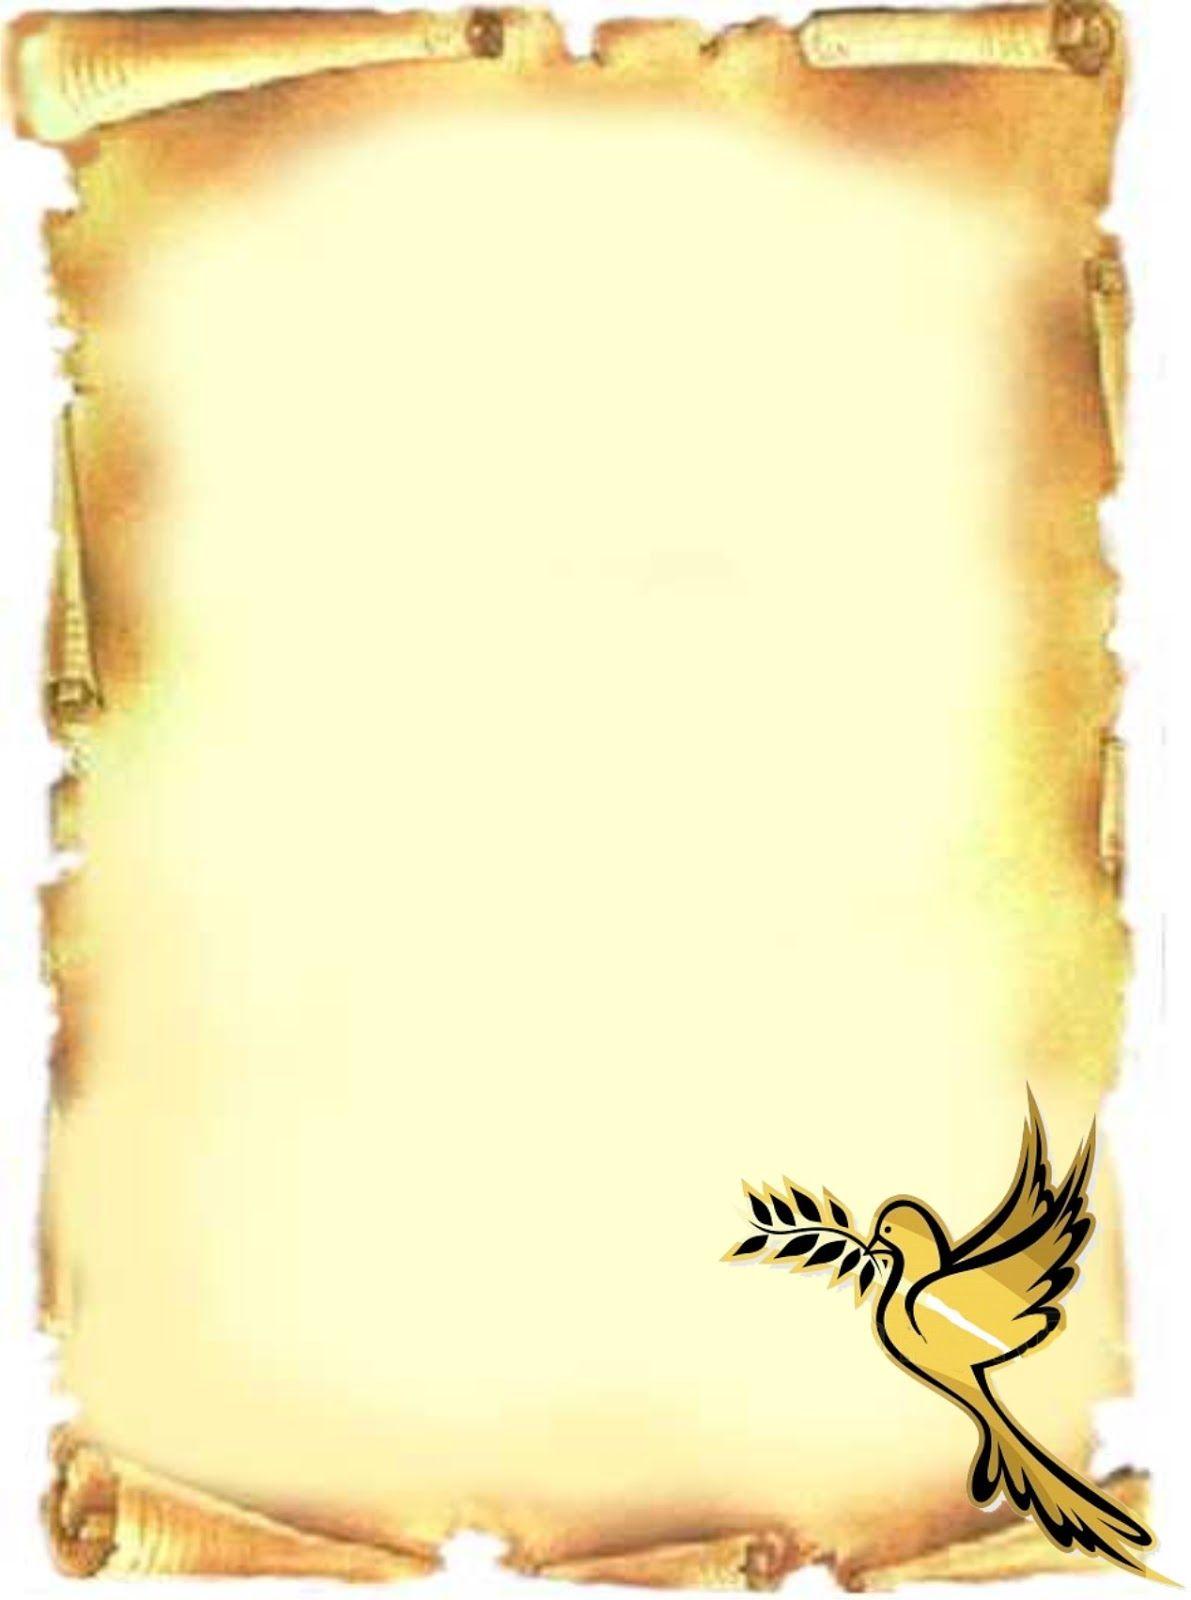 Arabesque Pour Word www.lindascaratulas: dia internacional de la paz: 21 de